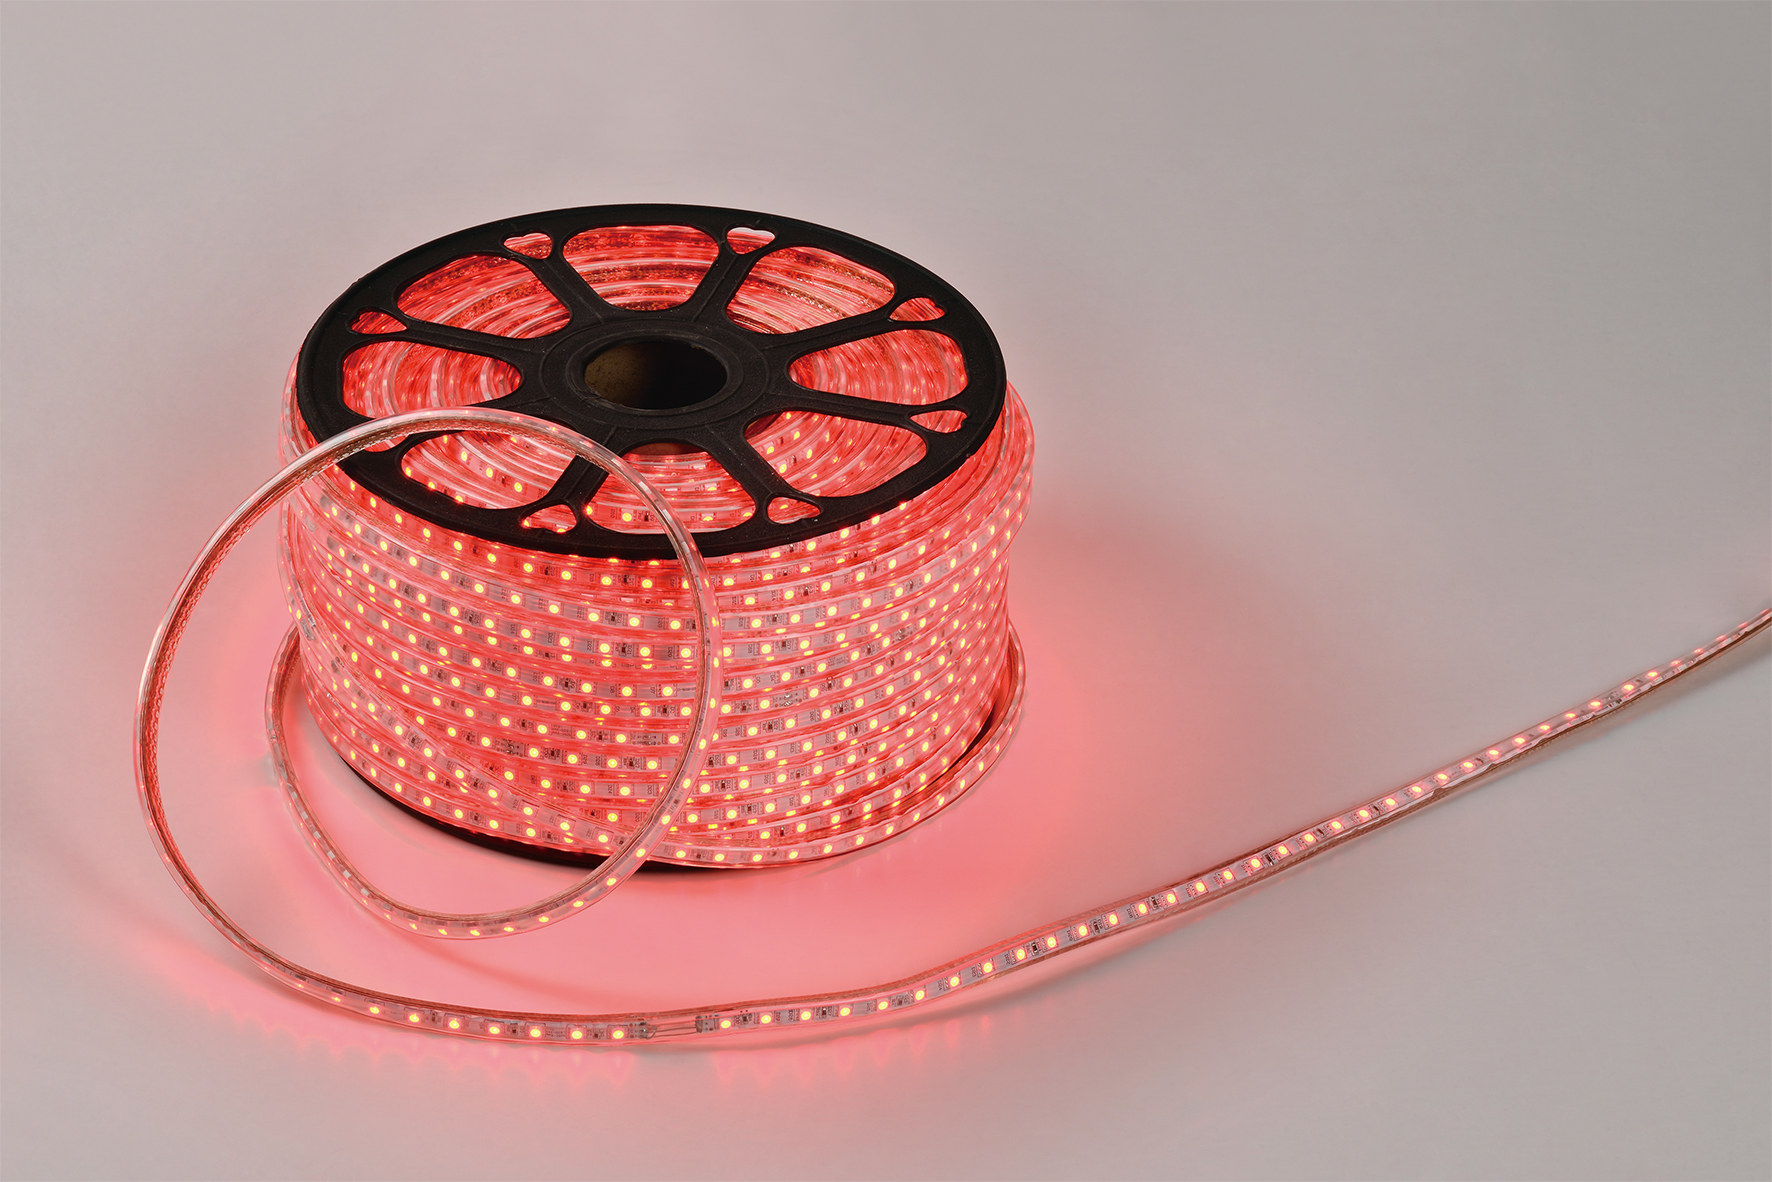 LED Strip 50m RGB Lighting Flexible 5050 60LEDs LED Leiste IP65 wasserdichte Ink.Trafo&Fernbebed.